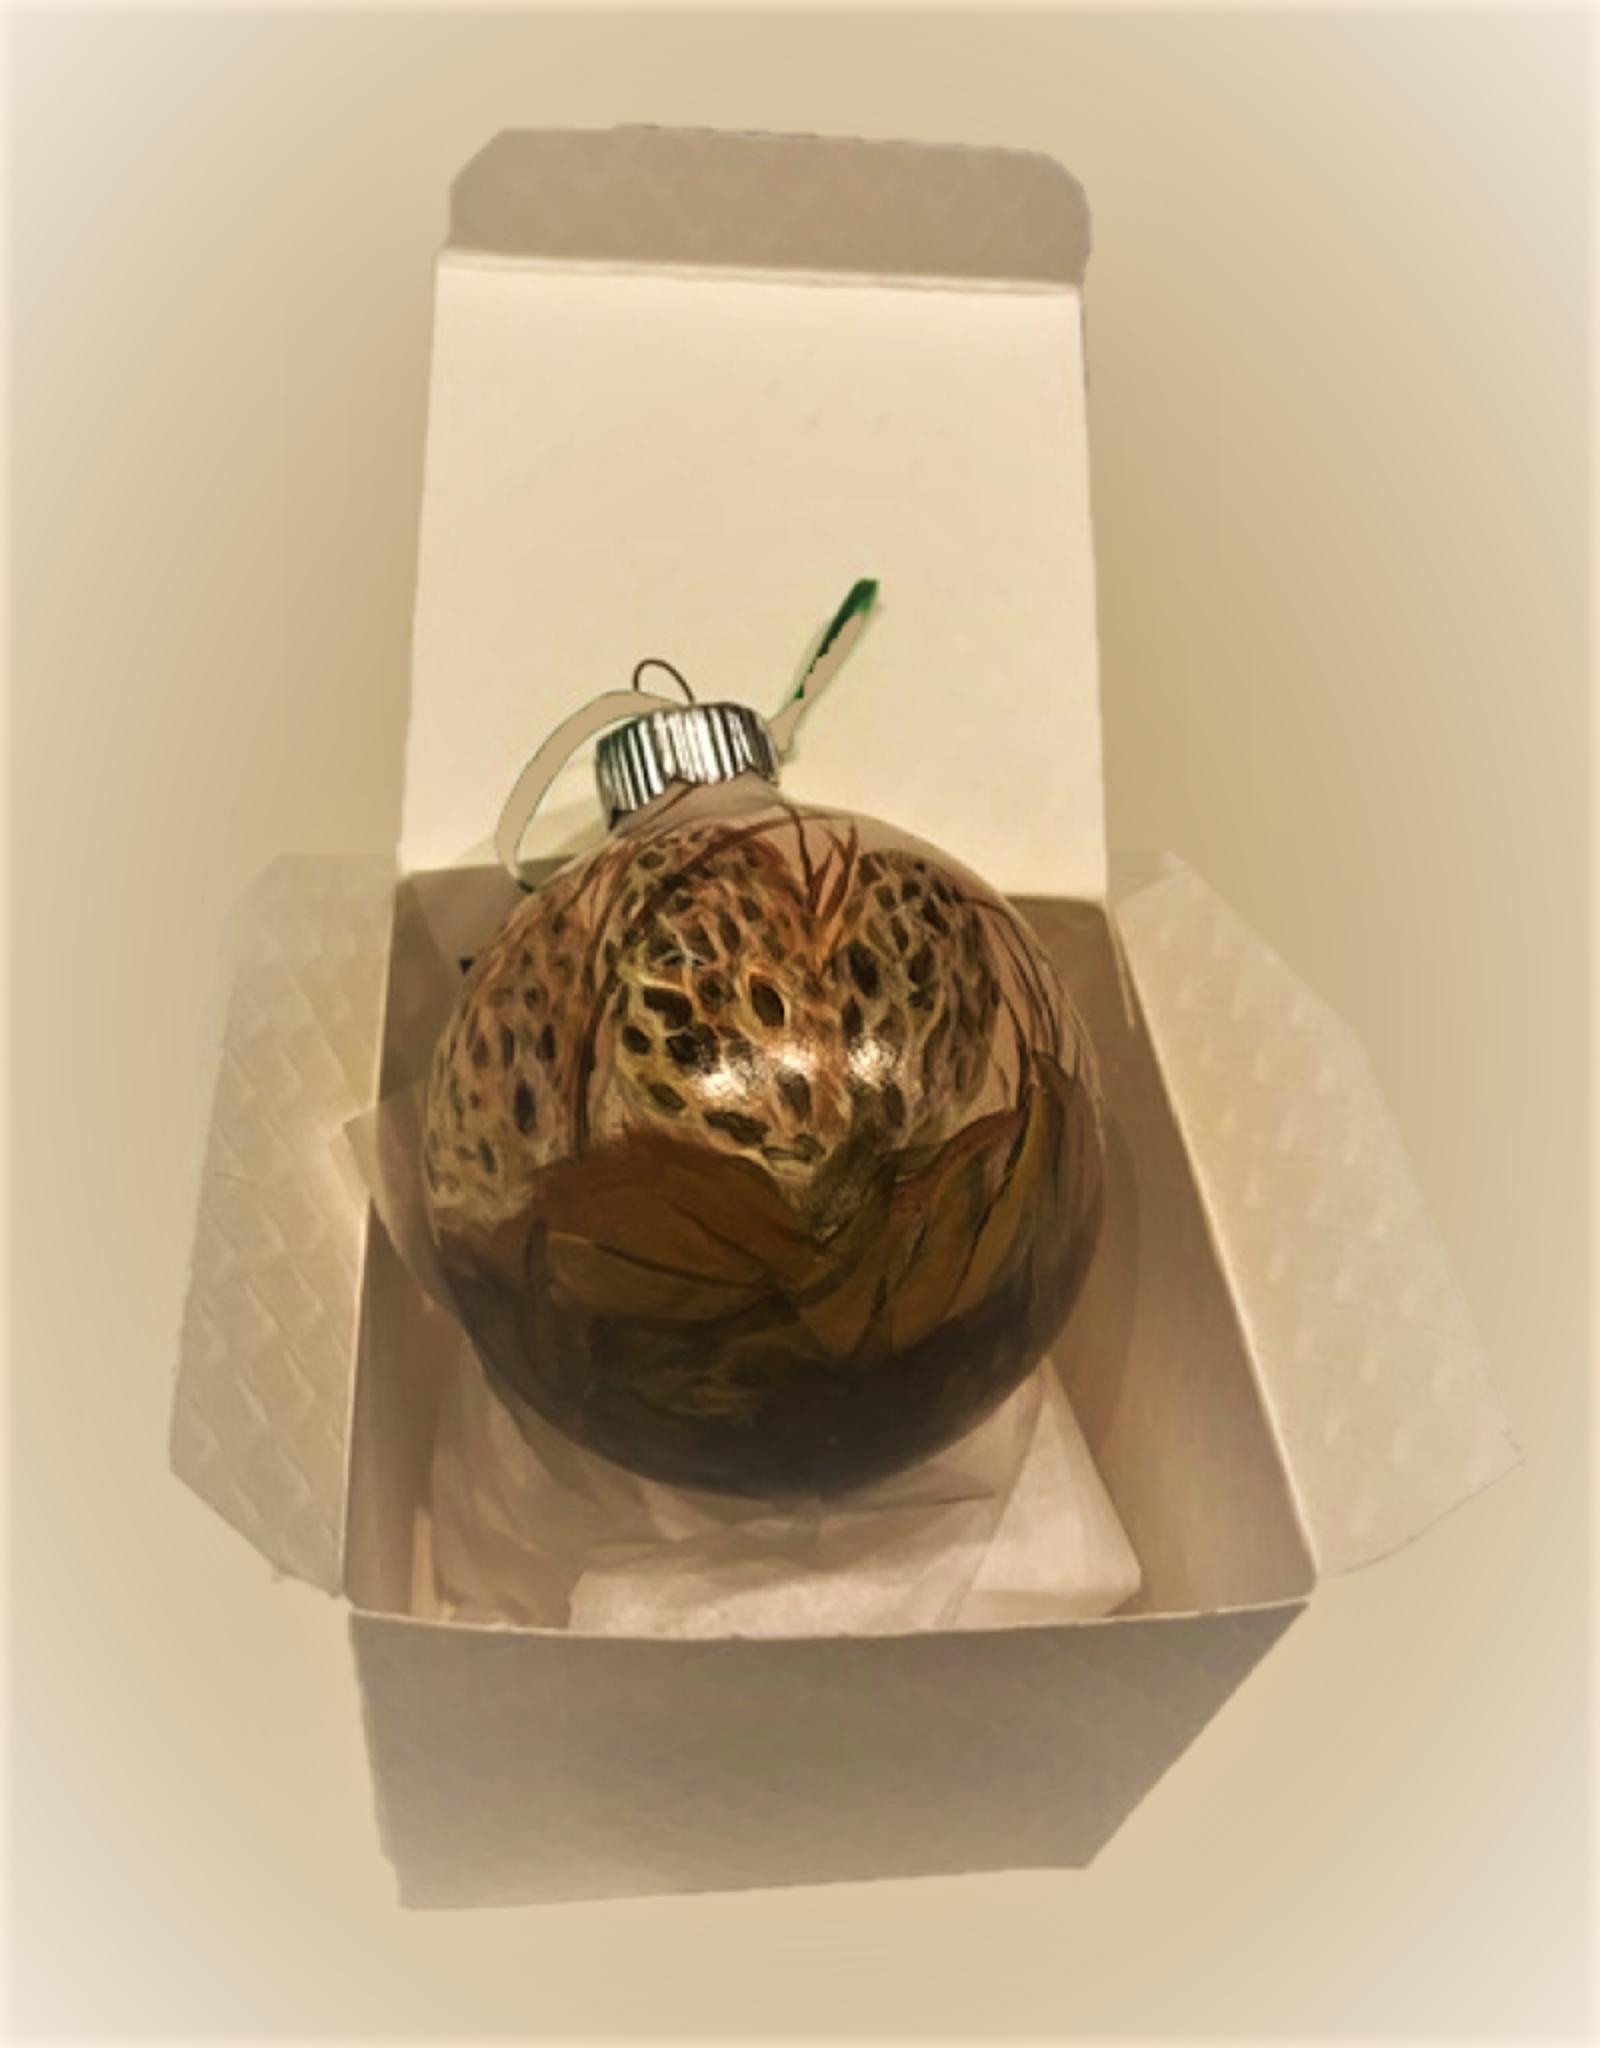 Ron Wetzel Art Handpainted Ornament - Morel Mushroom